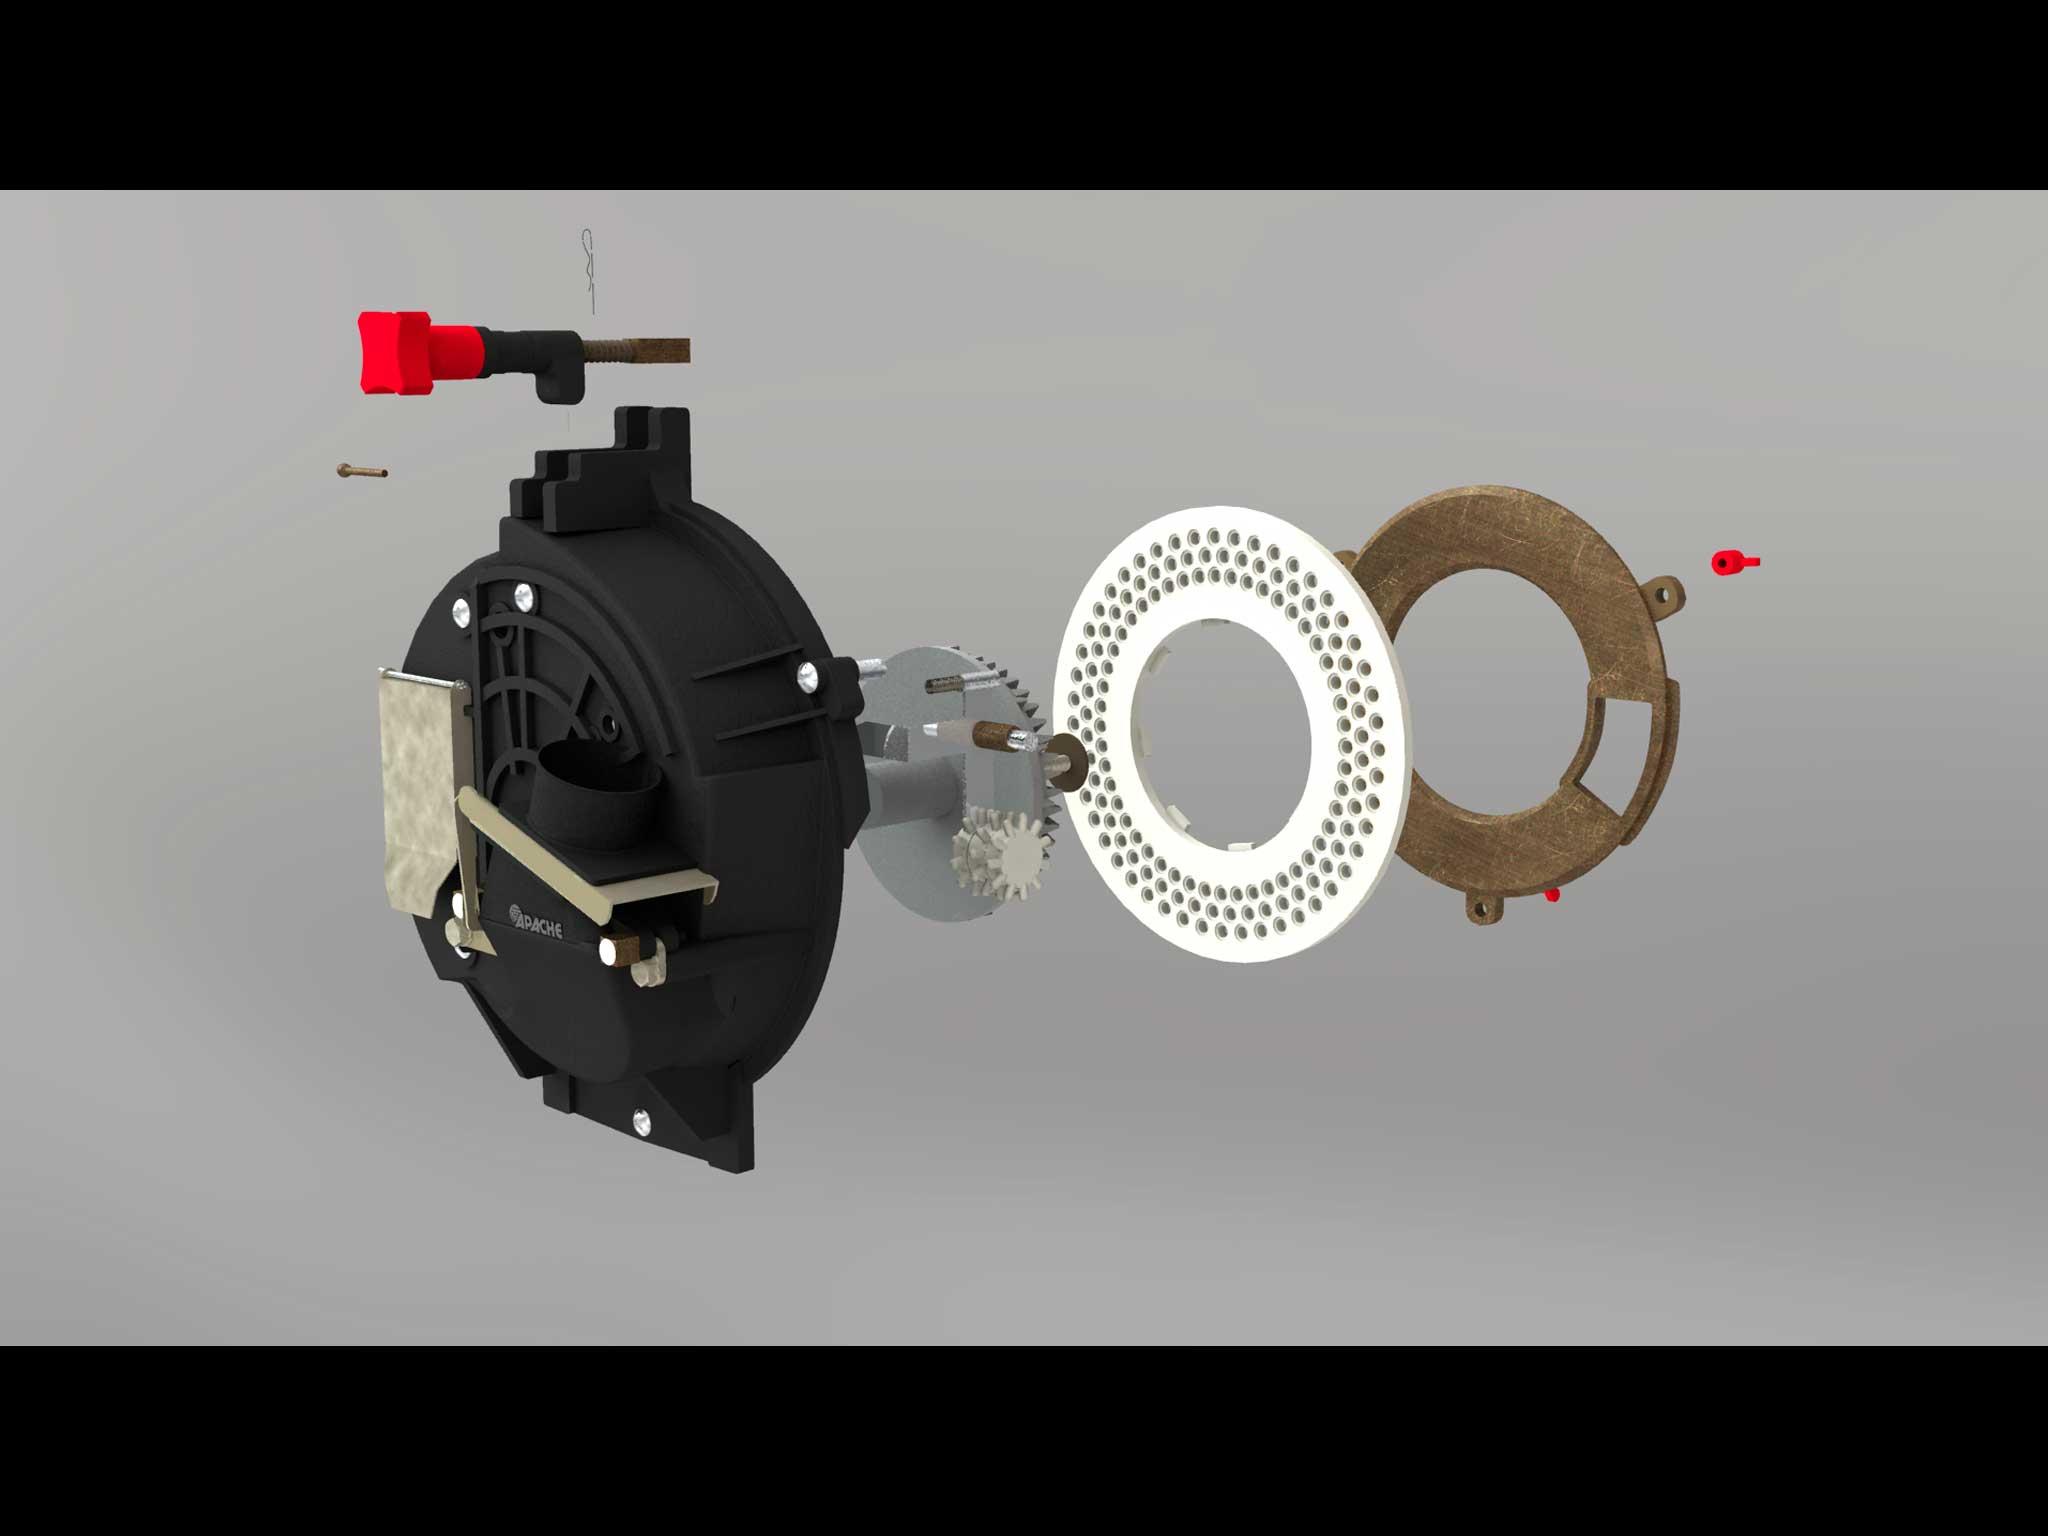 3D CAD Animation